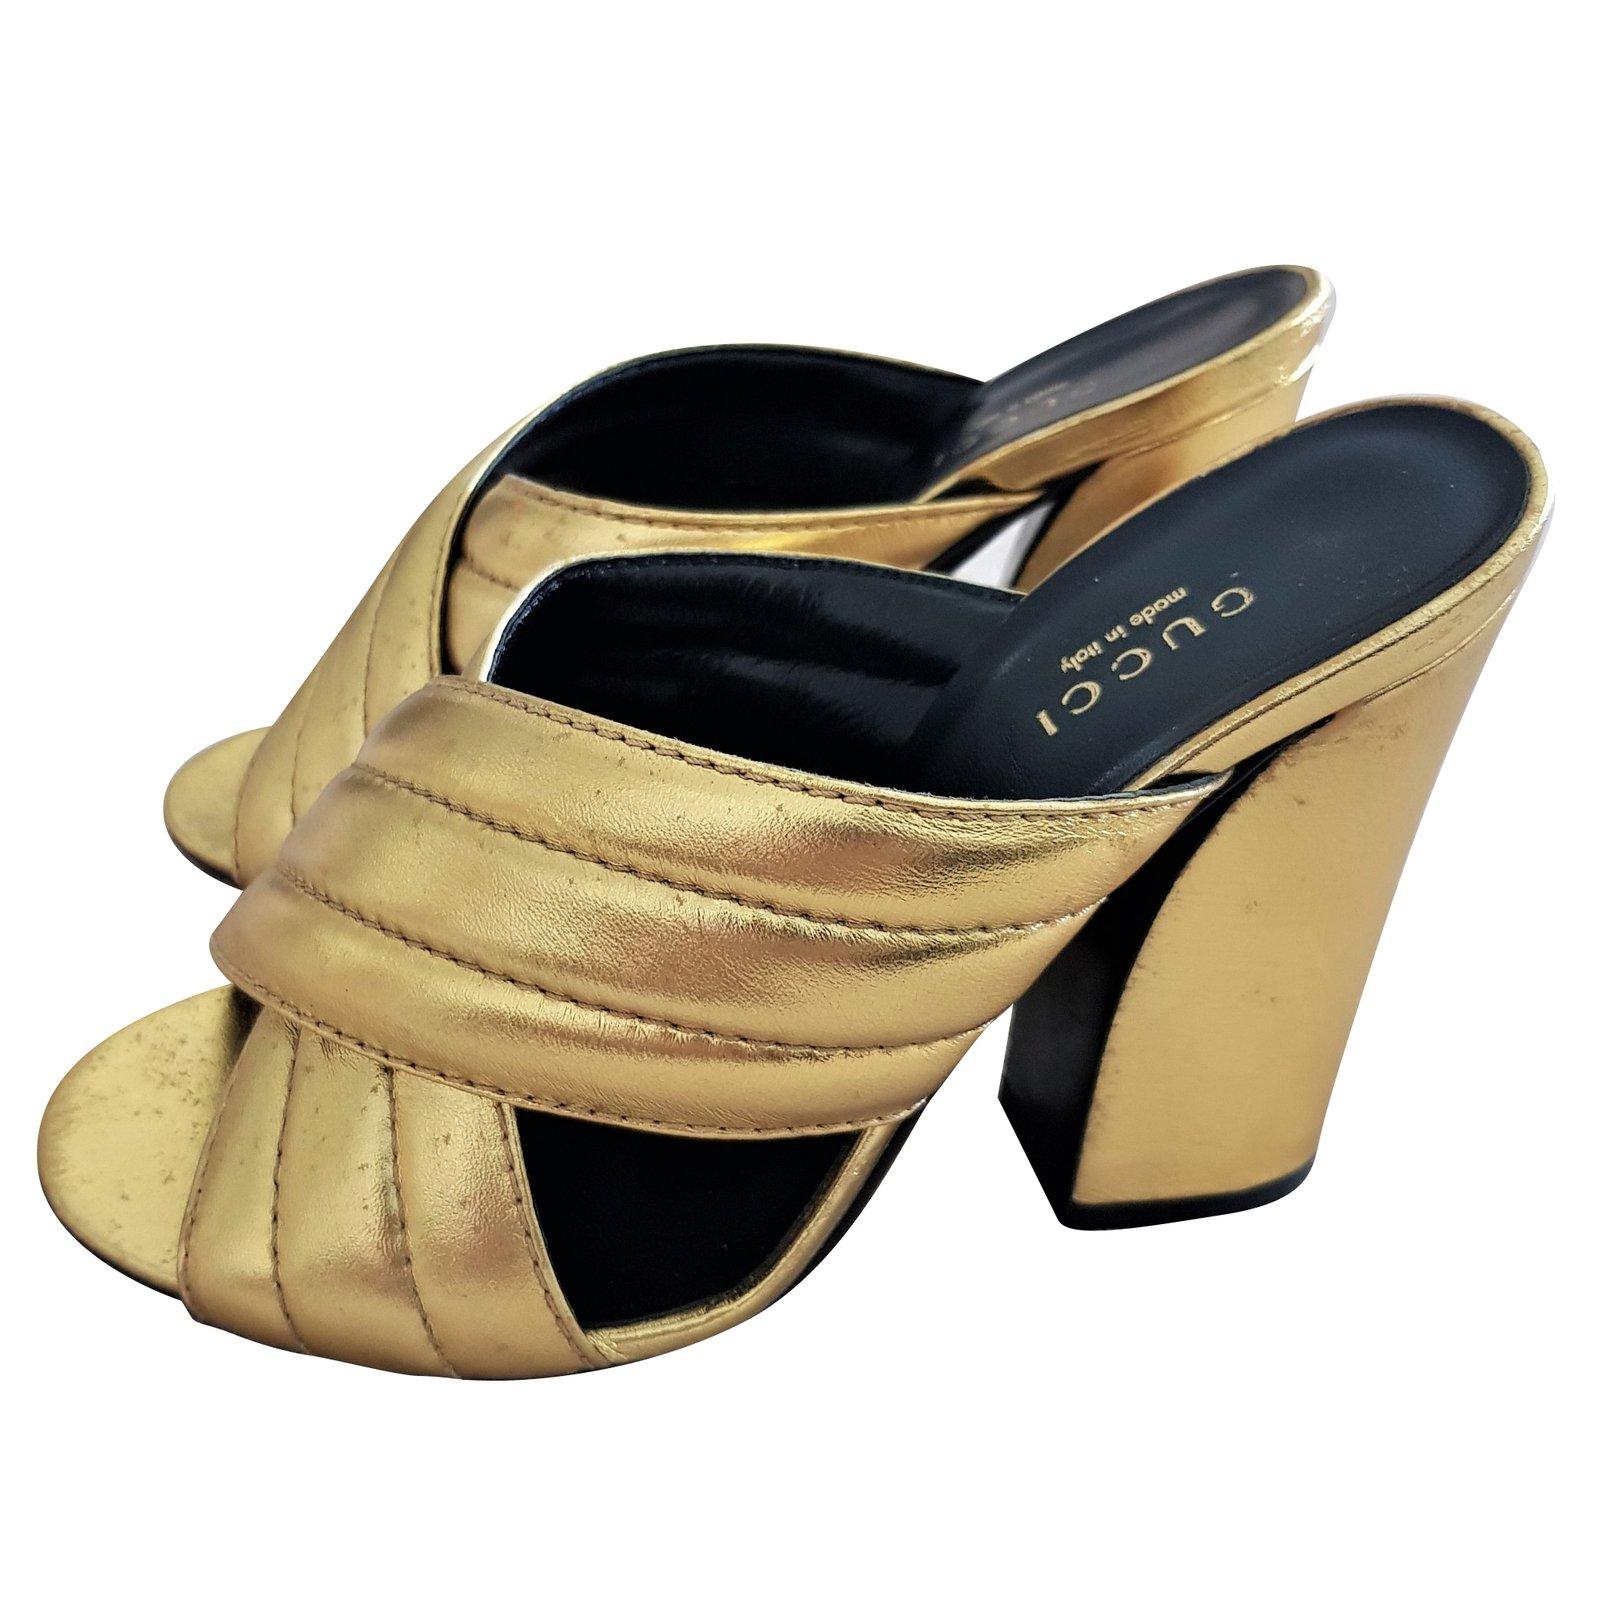 28f046c29e7f Gucci Mules Sandals Heels Leather Golden ref.74756 - Joli Closet